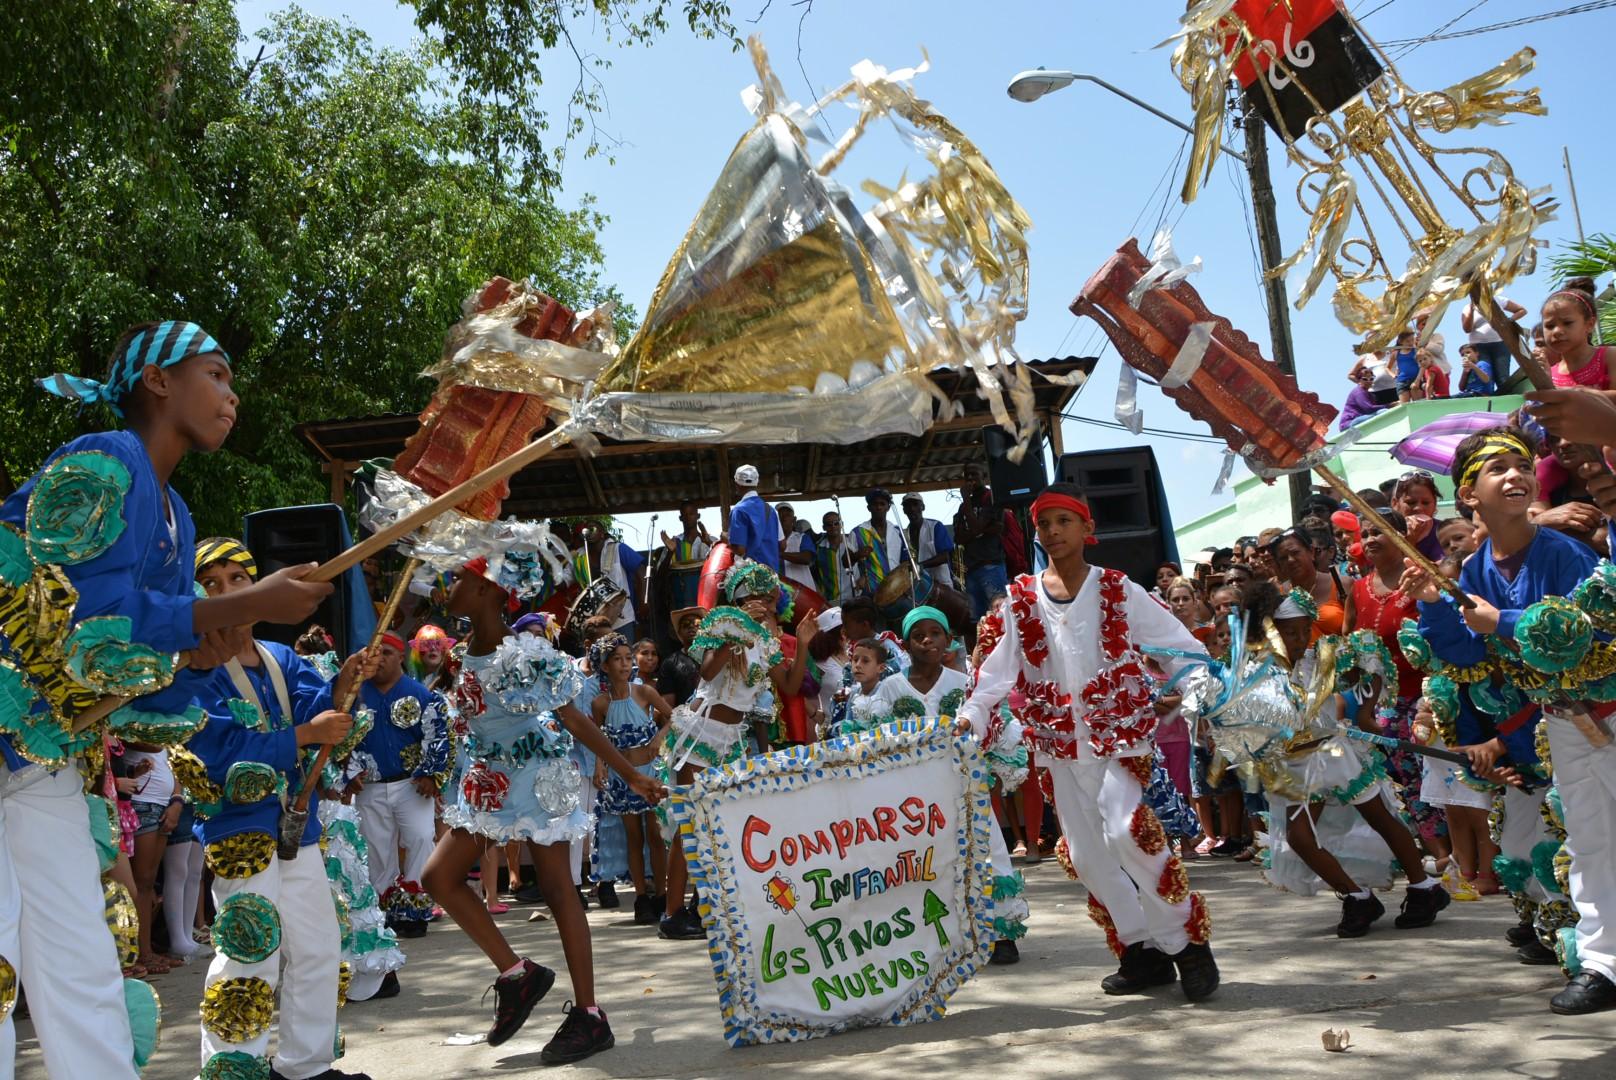 Santiago Espirituano, carnaval, Sancti Spíritus, Sancti Spíritus en 26, Cuba